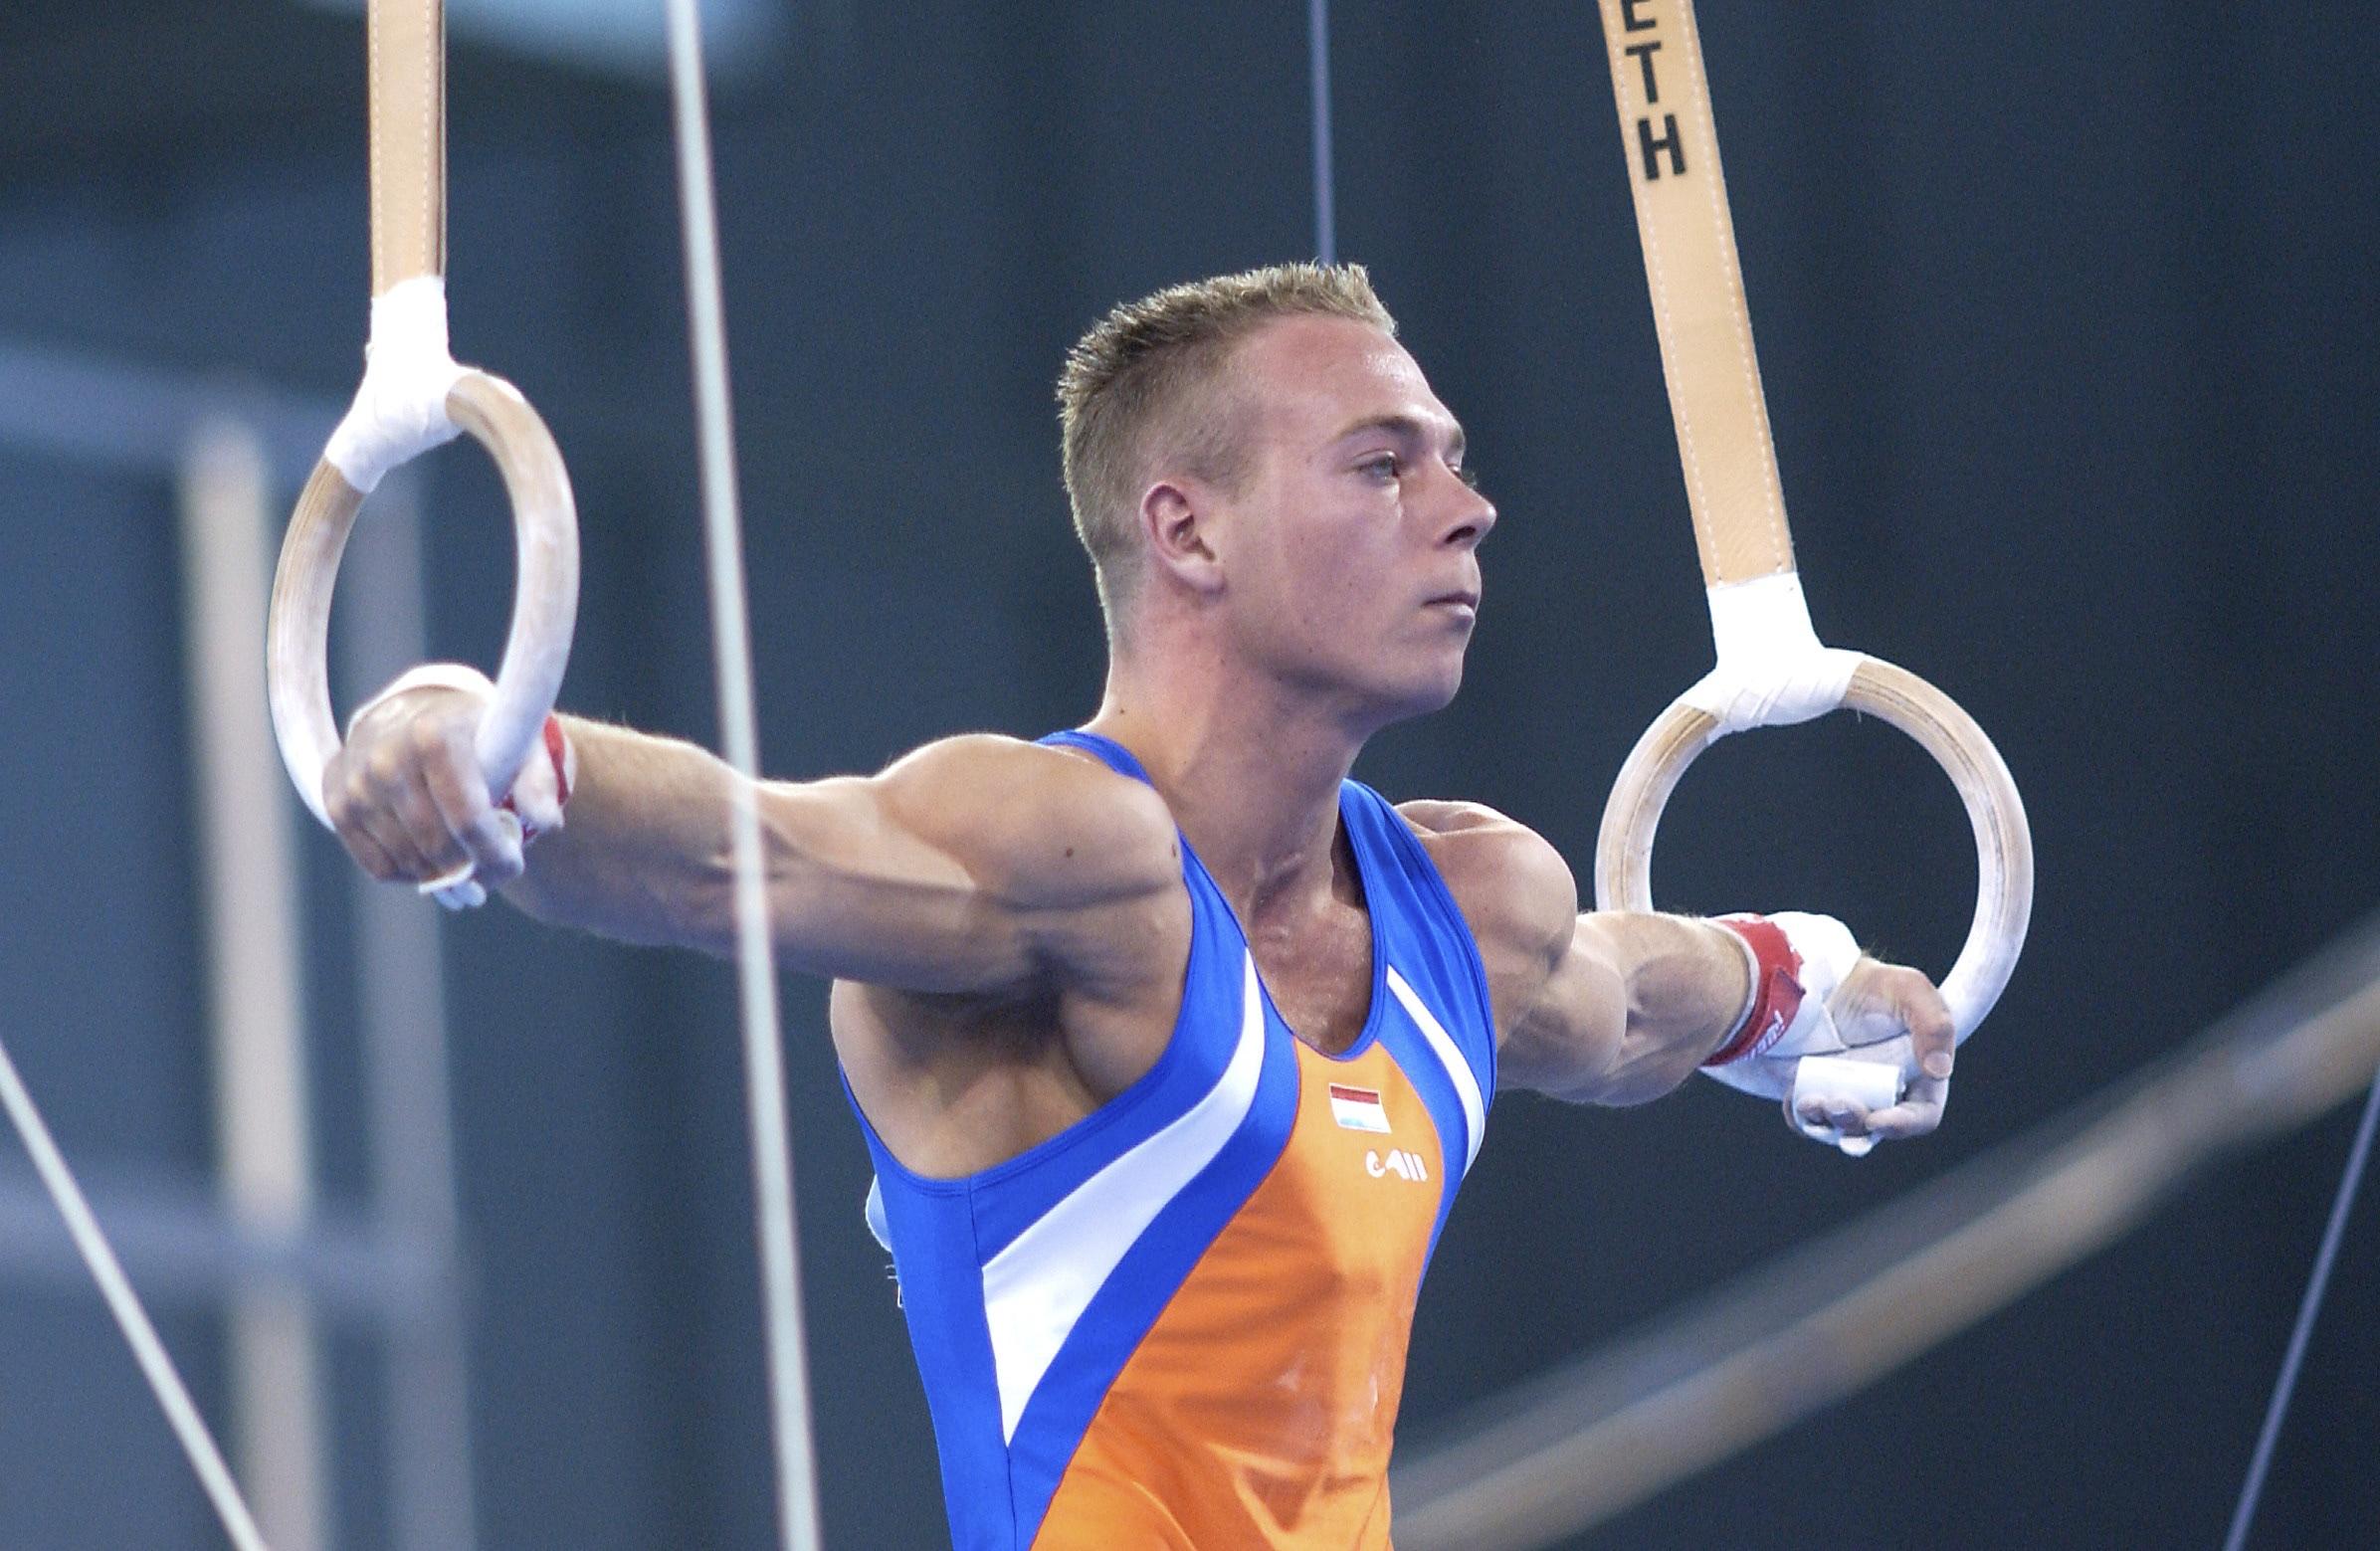 31st European Men's Artistic Gymnastics Championships, 2014 May 19-25, Ljubljana/SLO